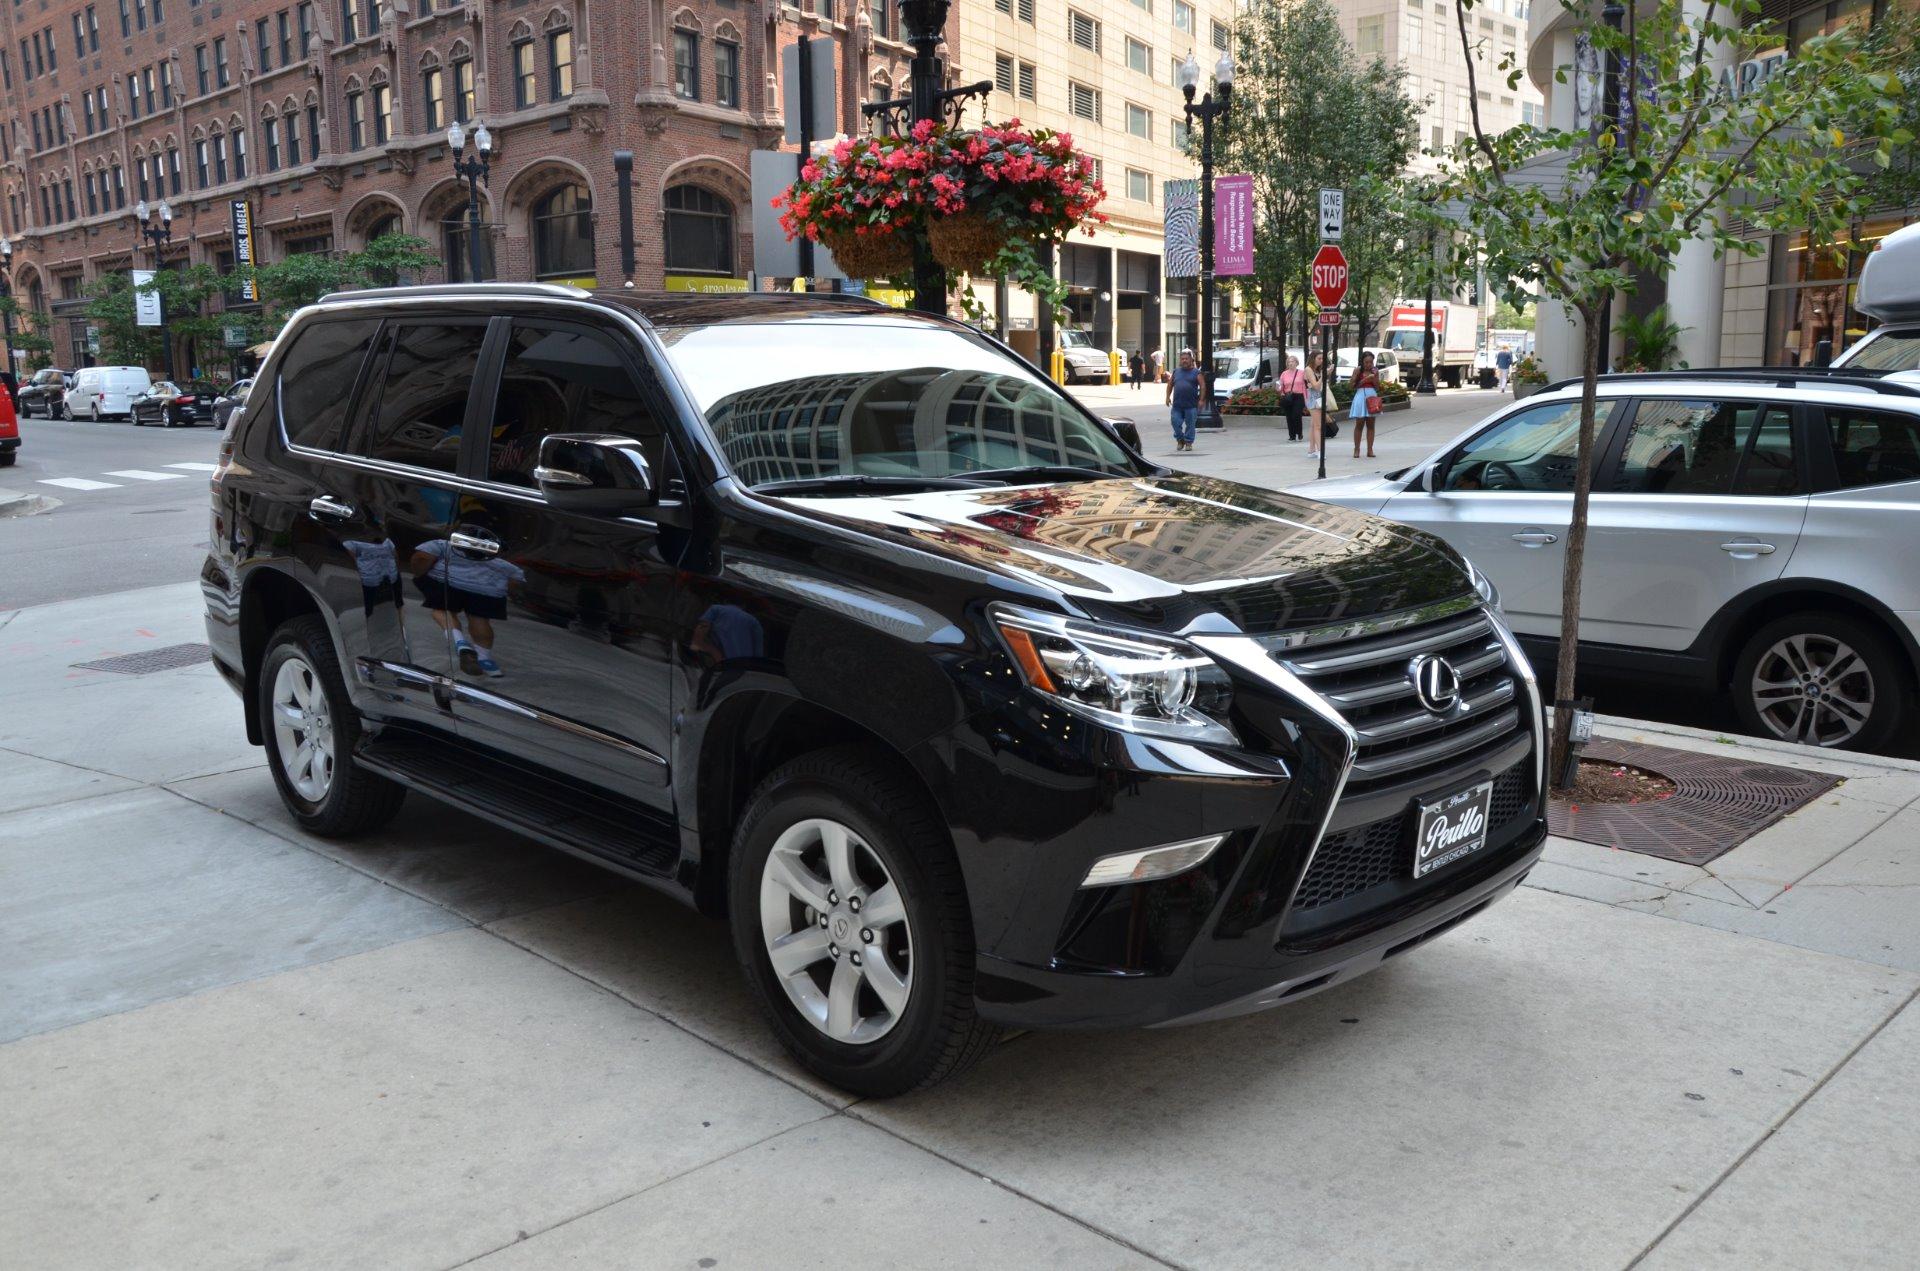 2017 Lexus GX 460 Stock B942B for sale near Chicago IL